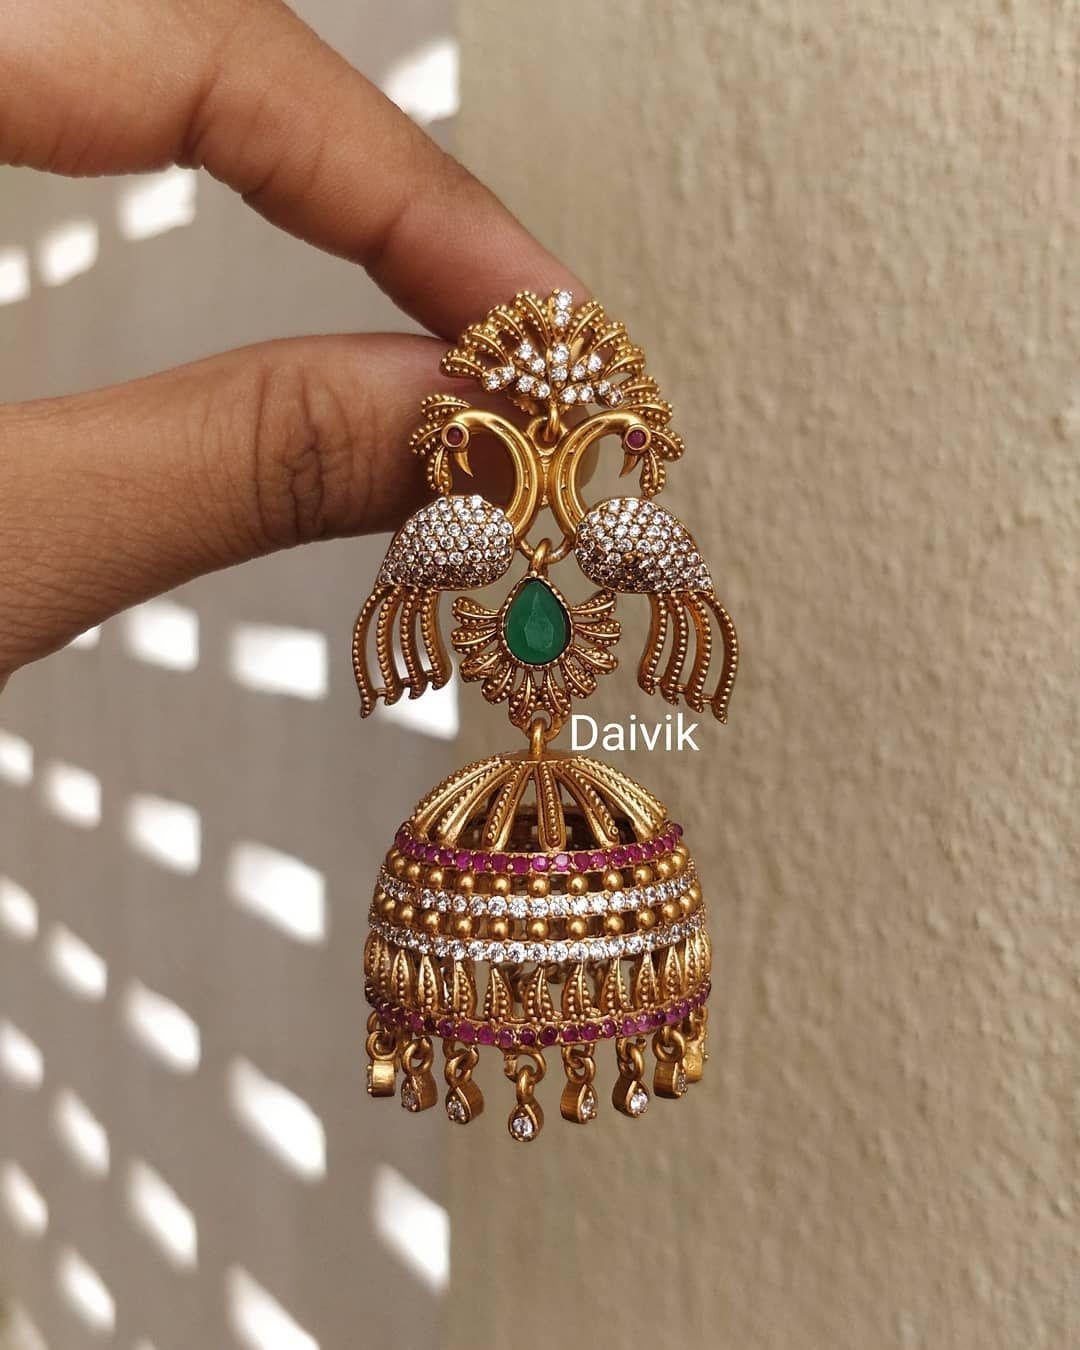 Blue Plan Beads Brass Metal 22 Grams Jhumka//Earring 3 Handmade Indian Jewelry Gift Jewelry